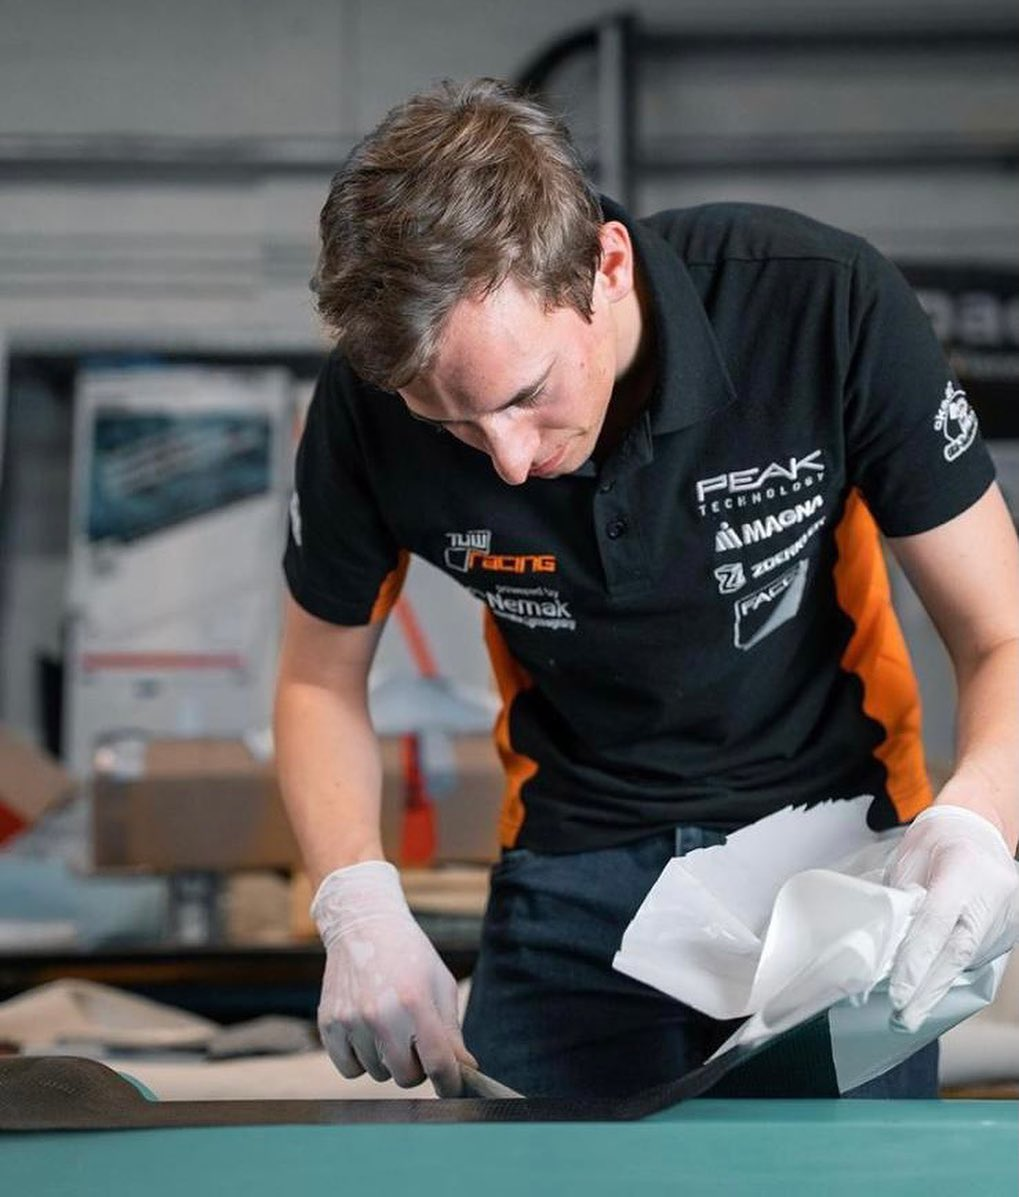 #capteamwear #motorsport #ontrack #formulastudent #formula #tuw #teamwear